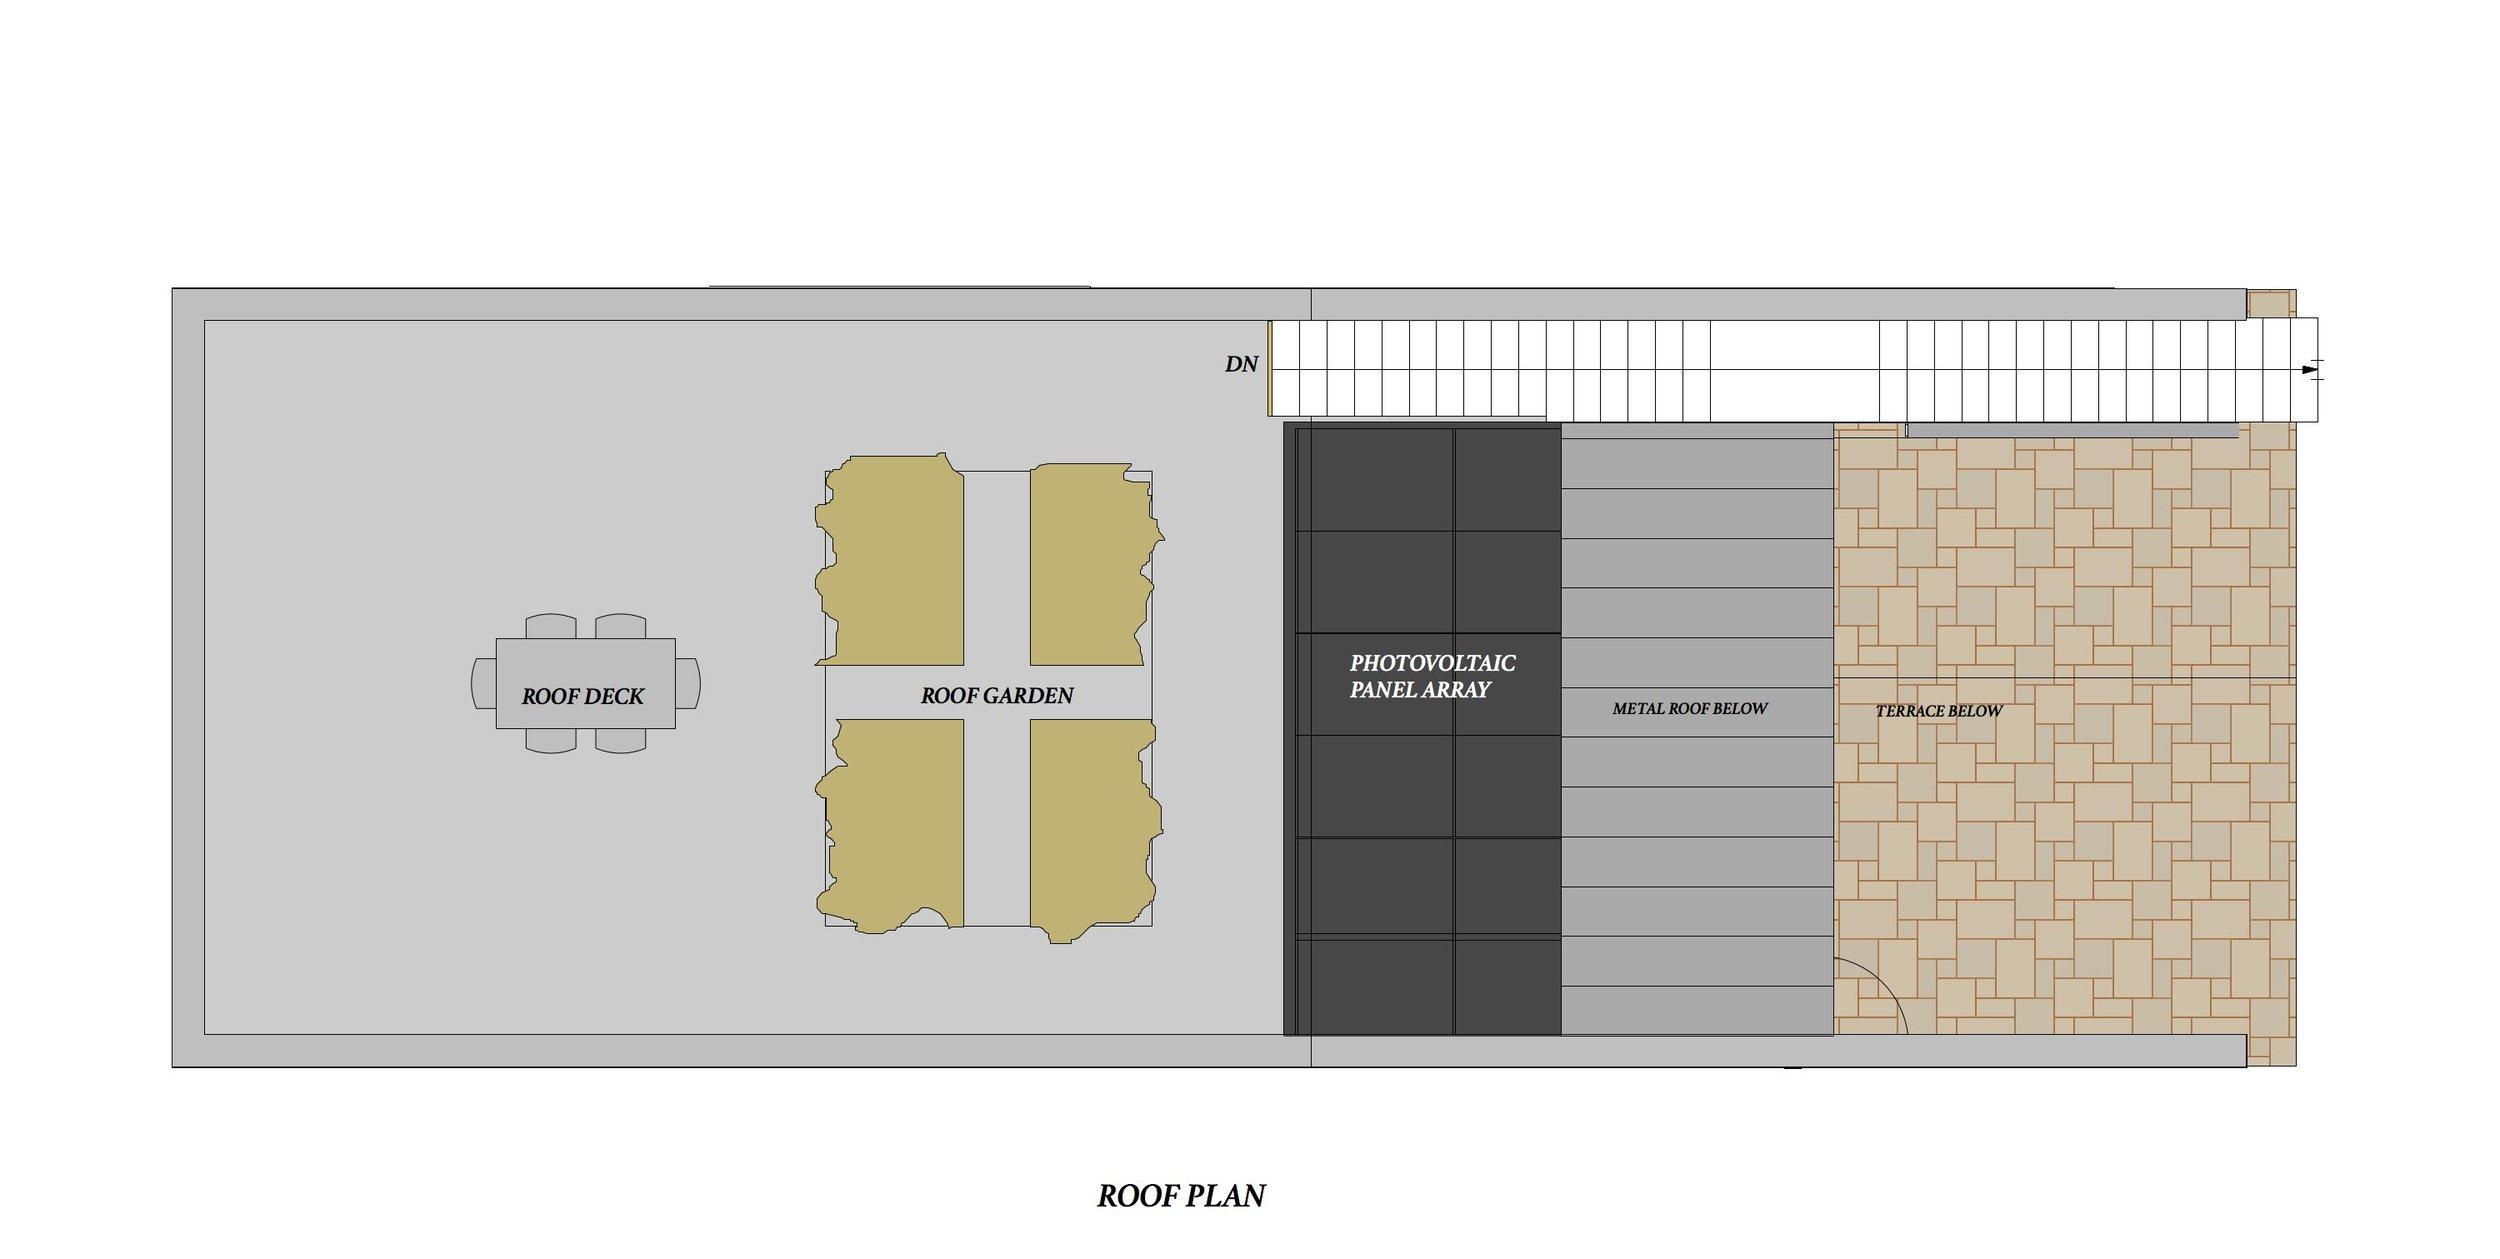 MODERN HOUSE 2 ROOF PLAN.jpg